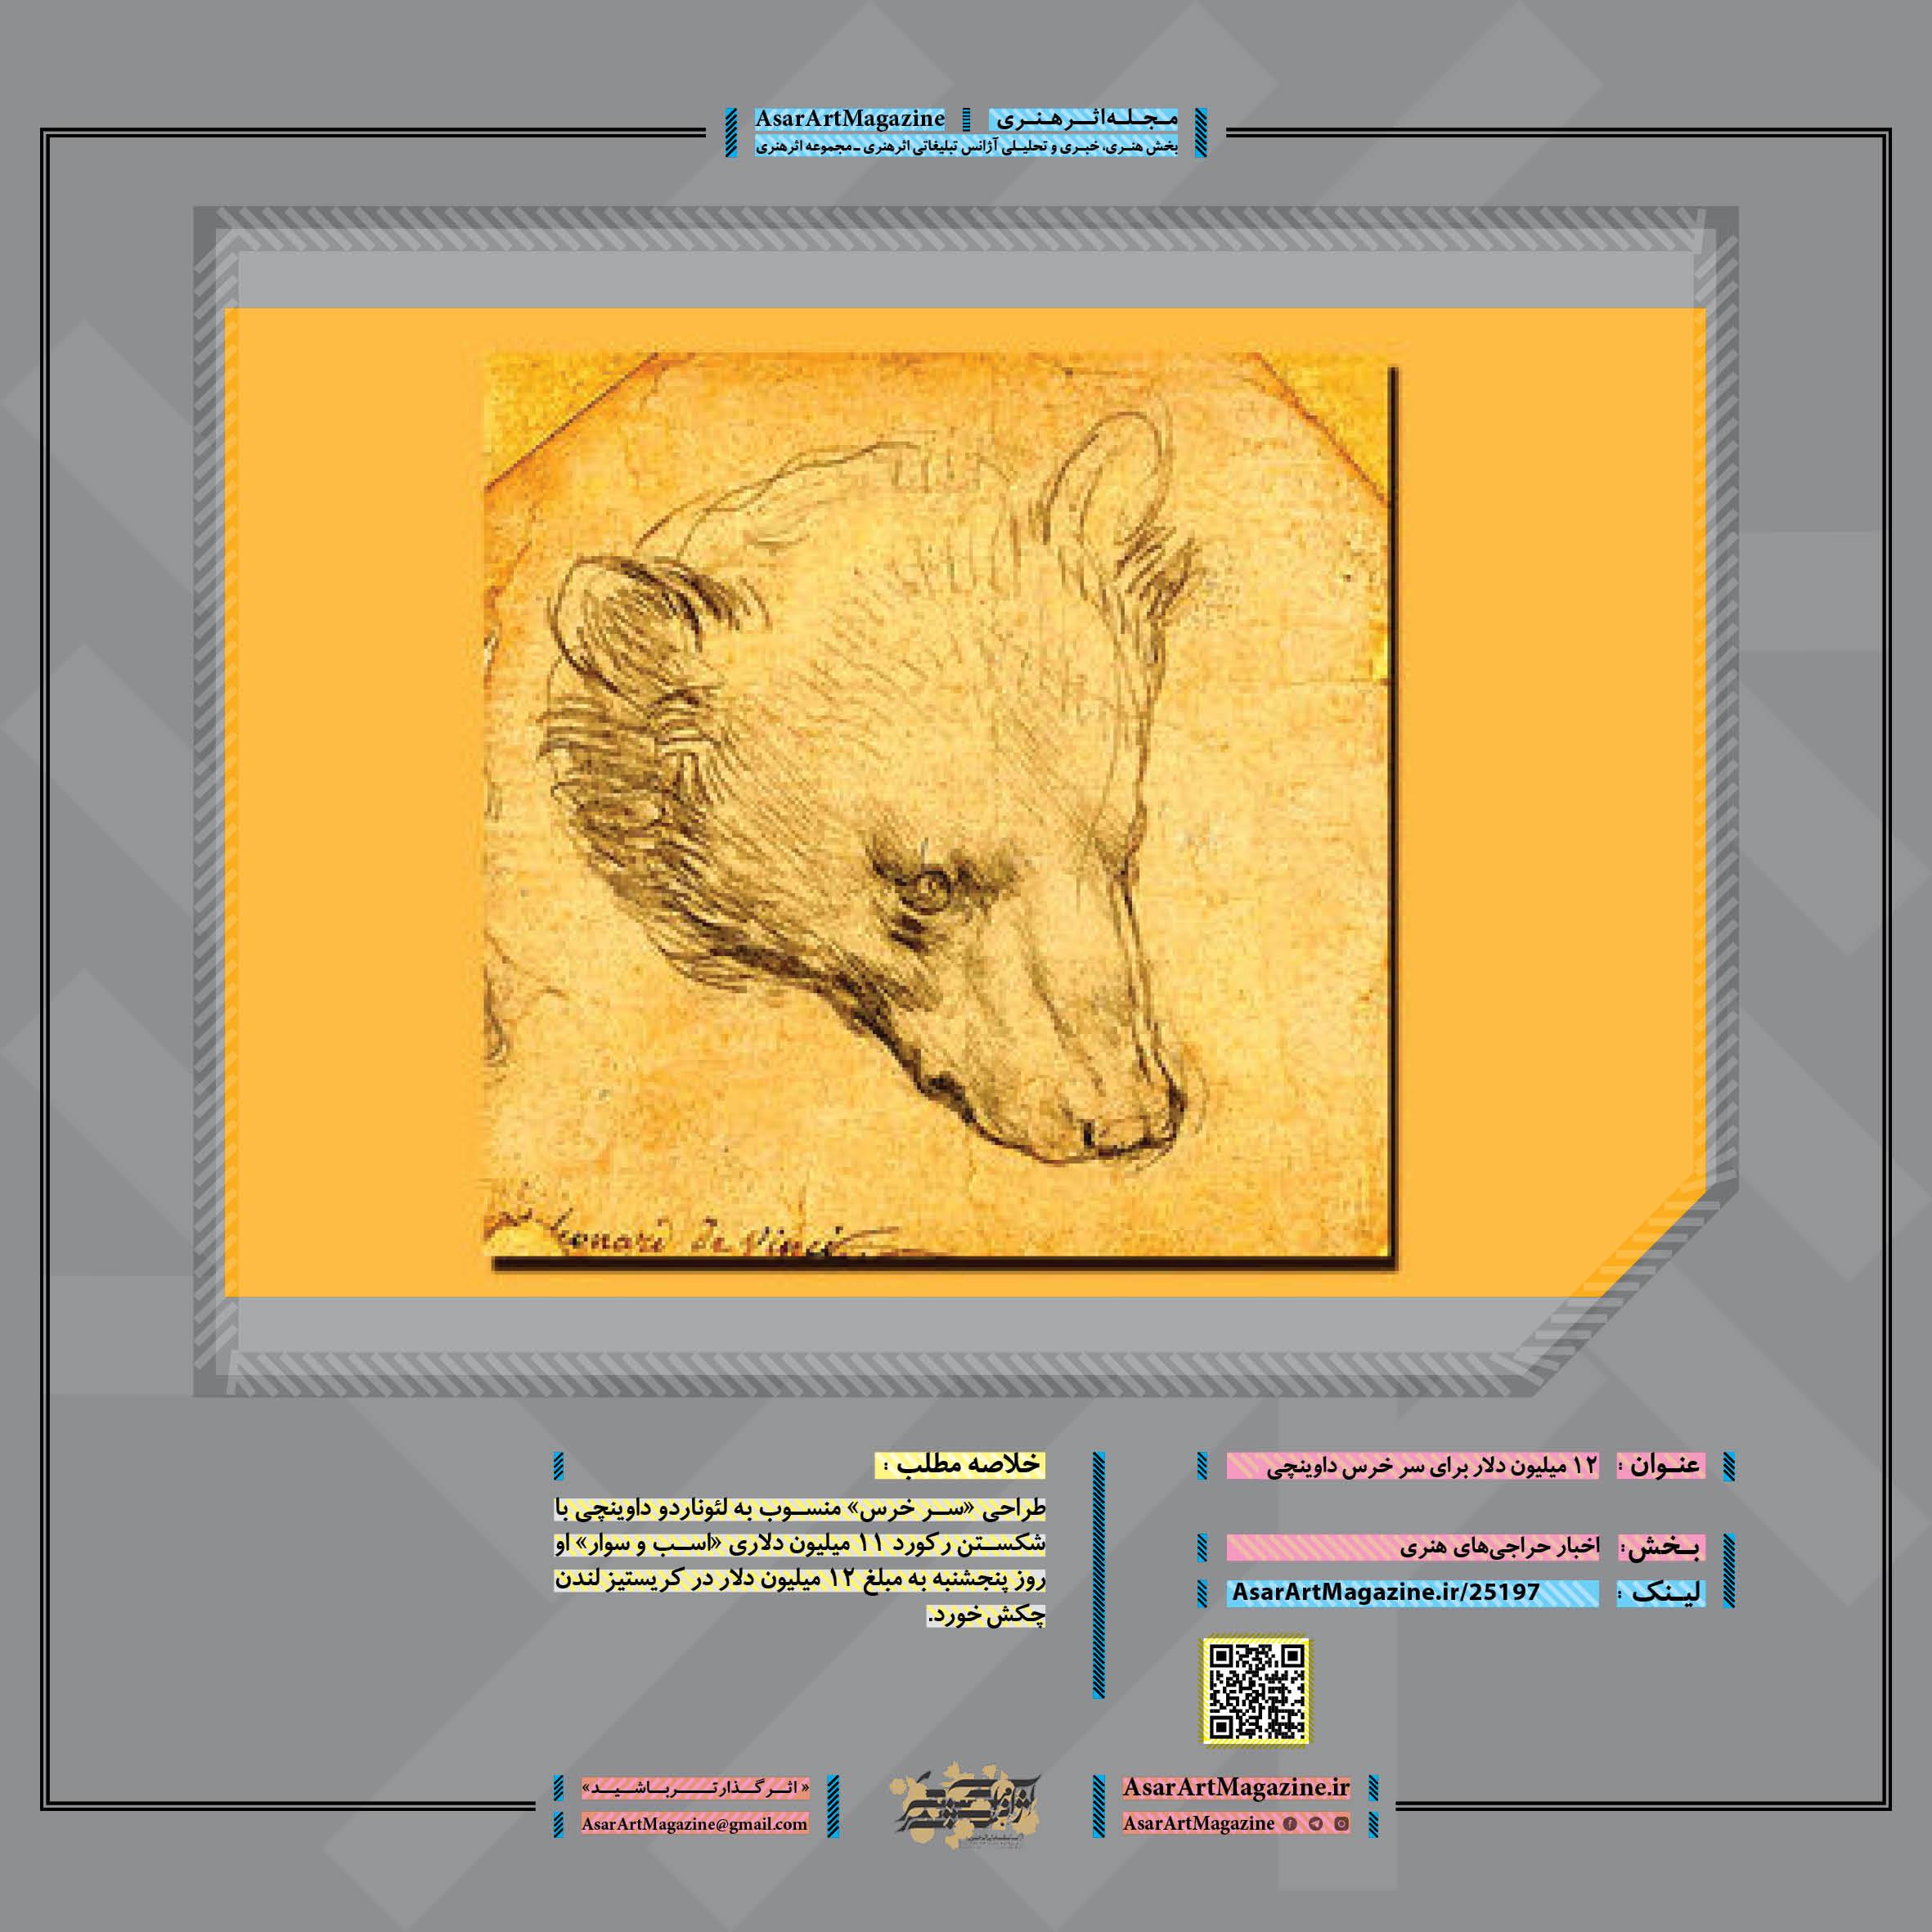 12 میلیون دلار برای سر خرس داوینچی  مجله اثرهنری ـ اثر هنری